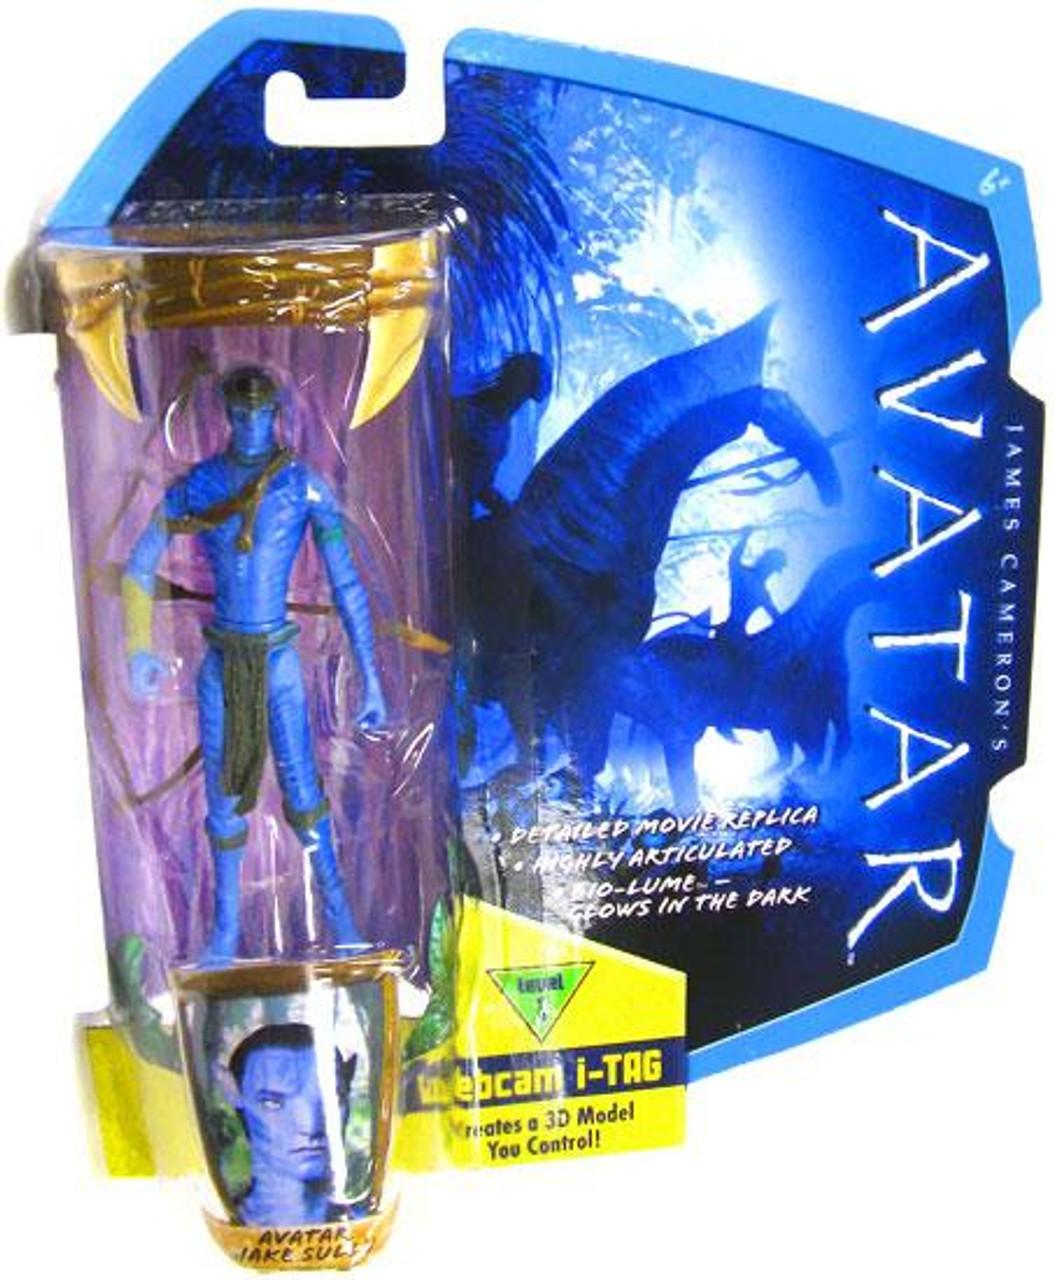 James Cameron's Avatar Avatar Jake Sully Action Figure